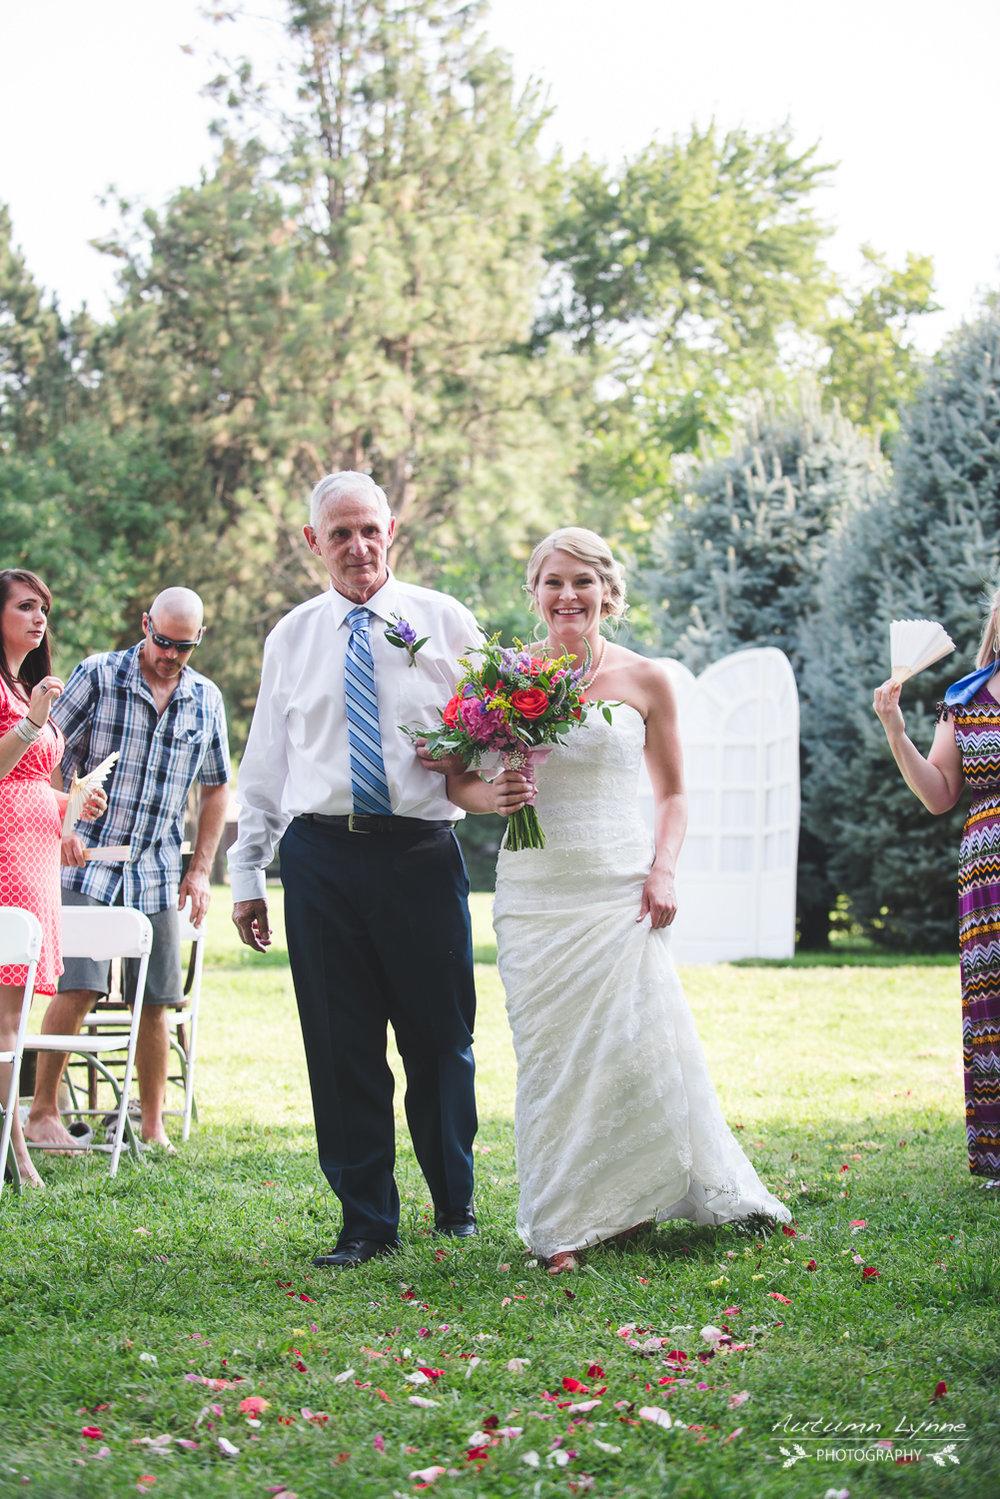 Hells Gate State Park Wedding Lewiston Idaho43.jpg